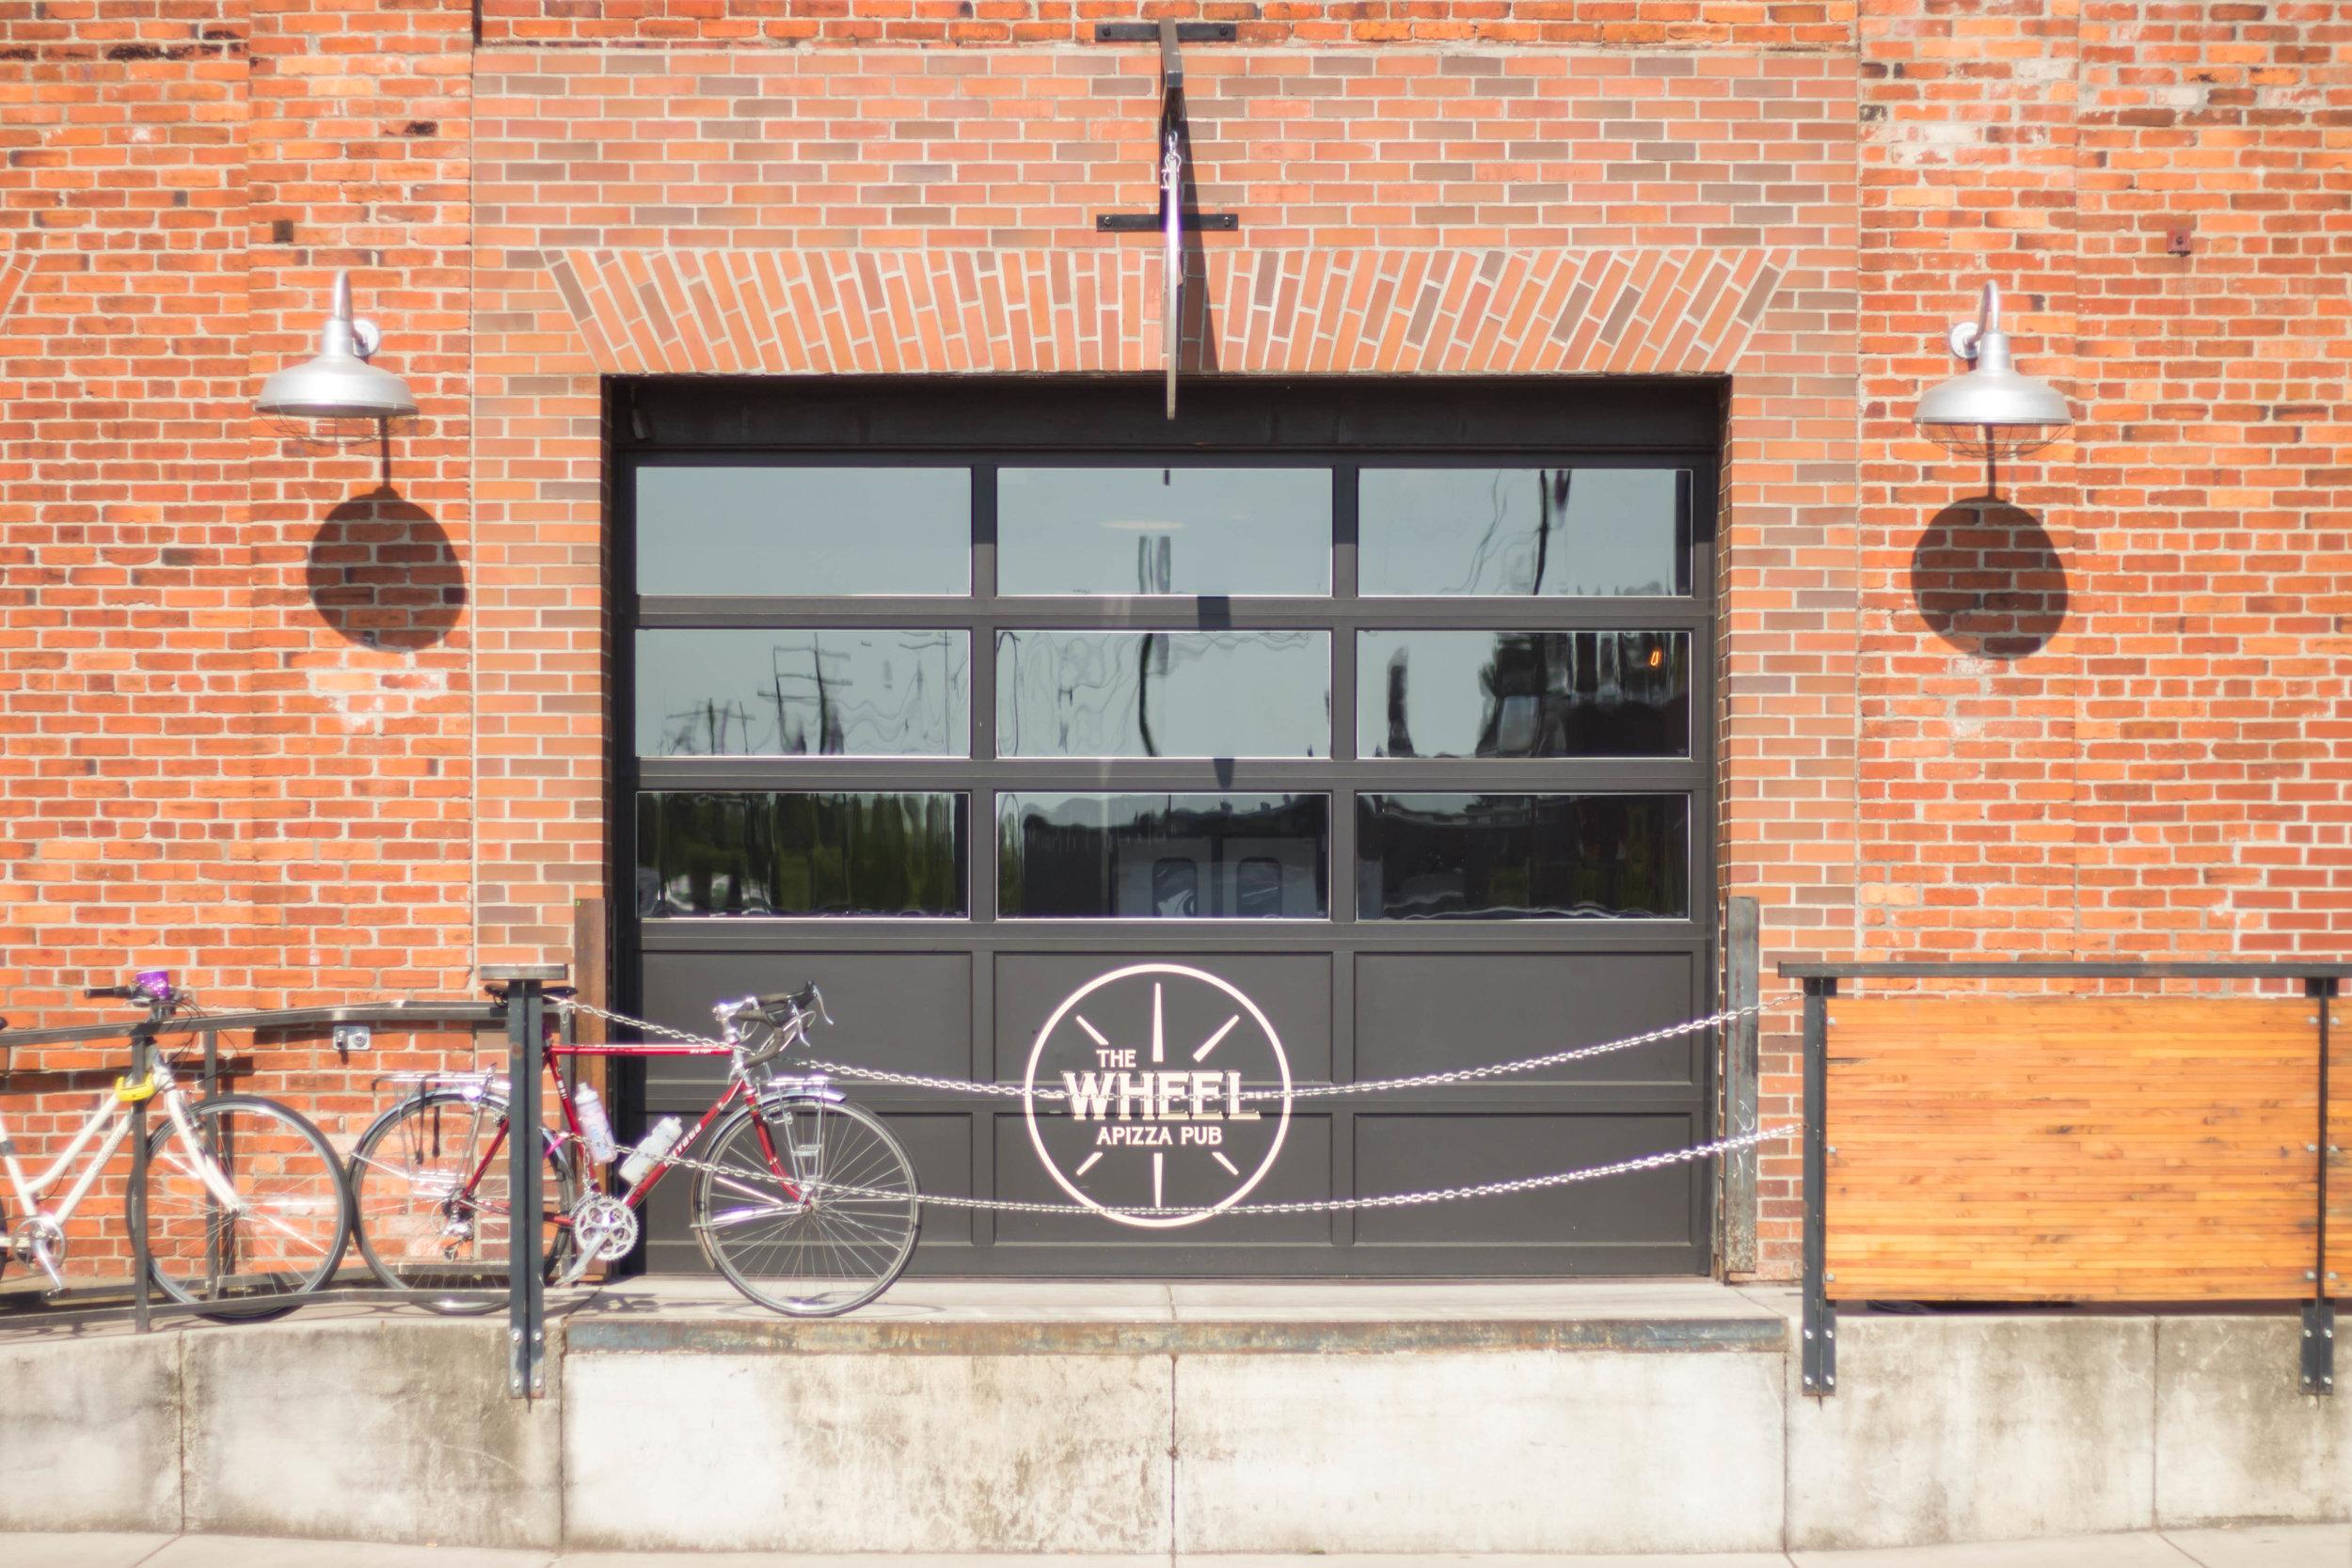 The Wheel Apizza Pub, Eugene, Oregon